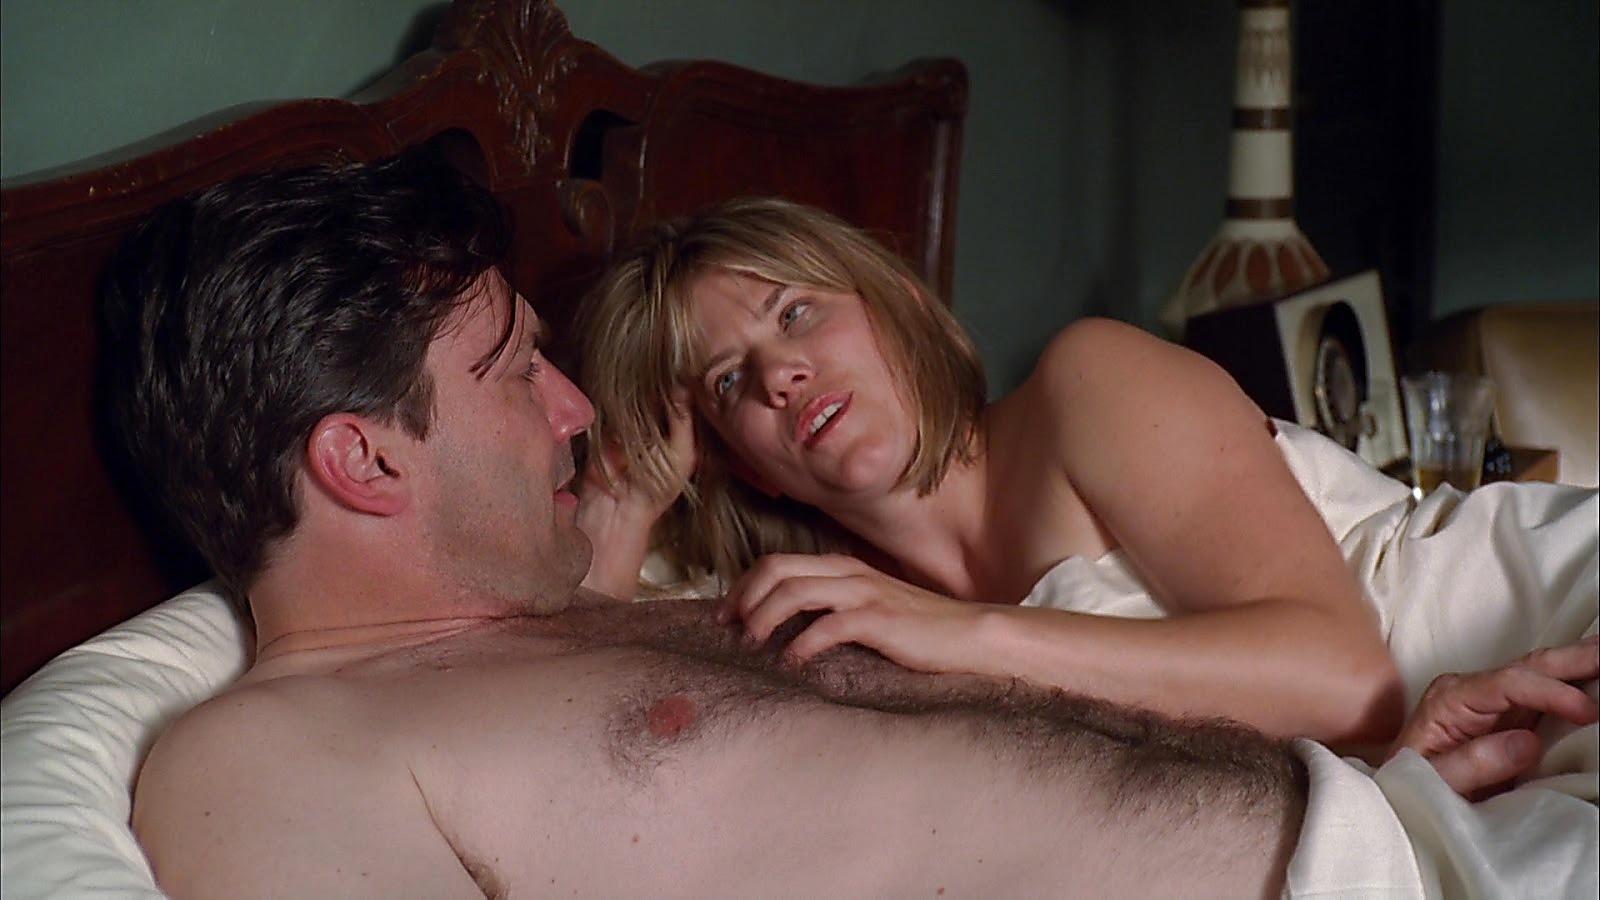 Jon Hamm sexy shirtless scene April 16, 2020, 6am